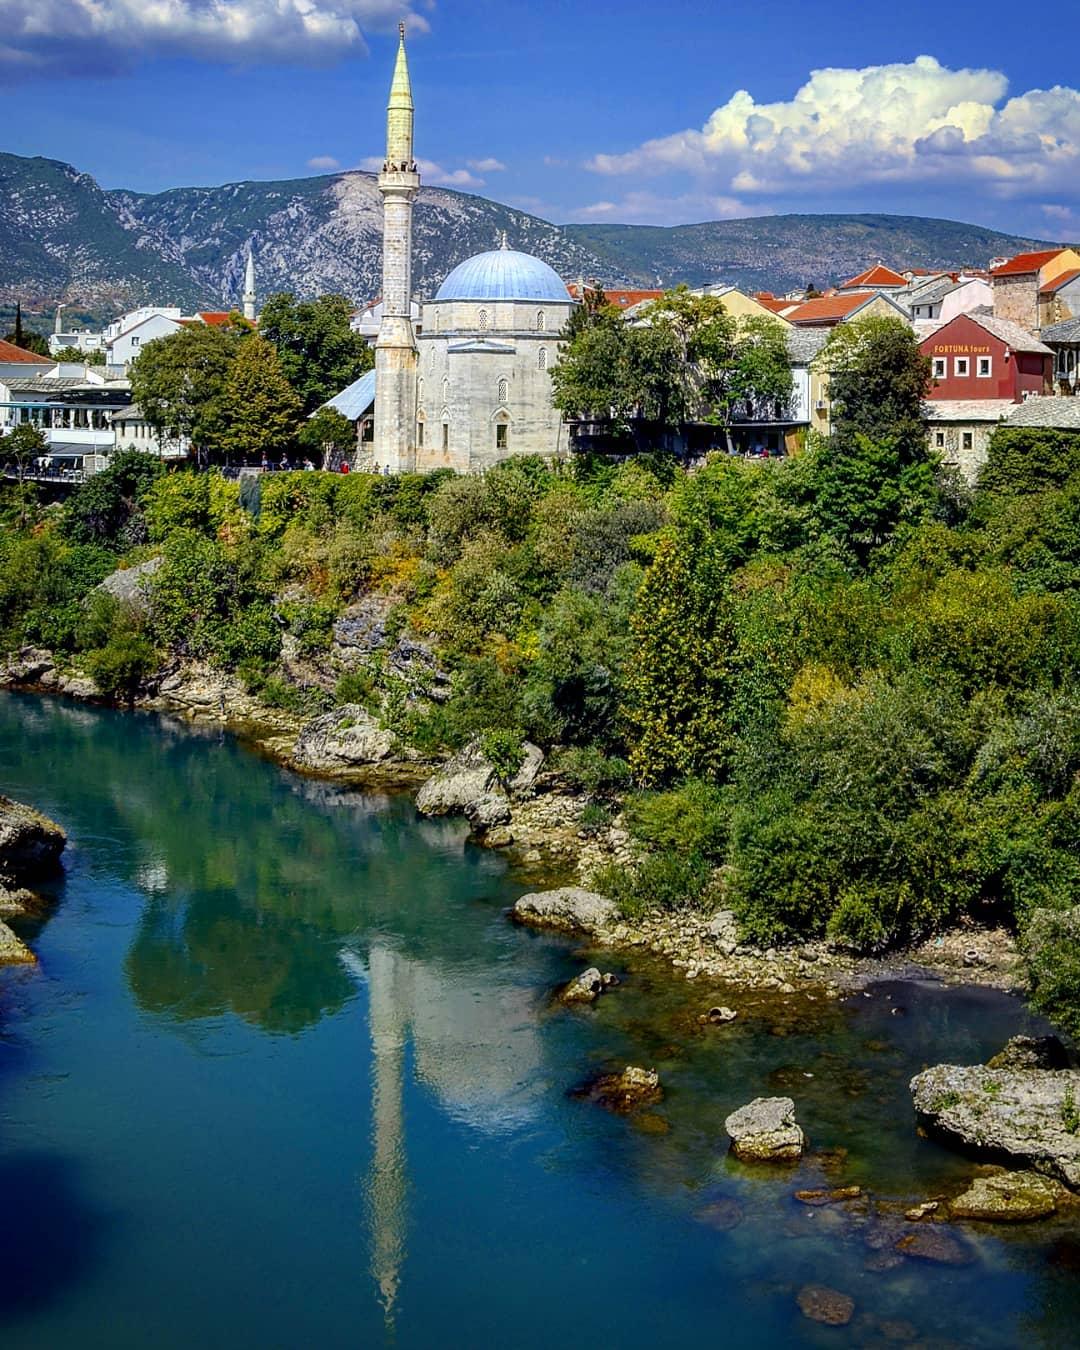 Mezquita Koski Mehmed Pasha